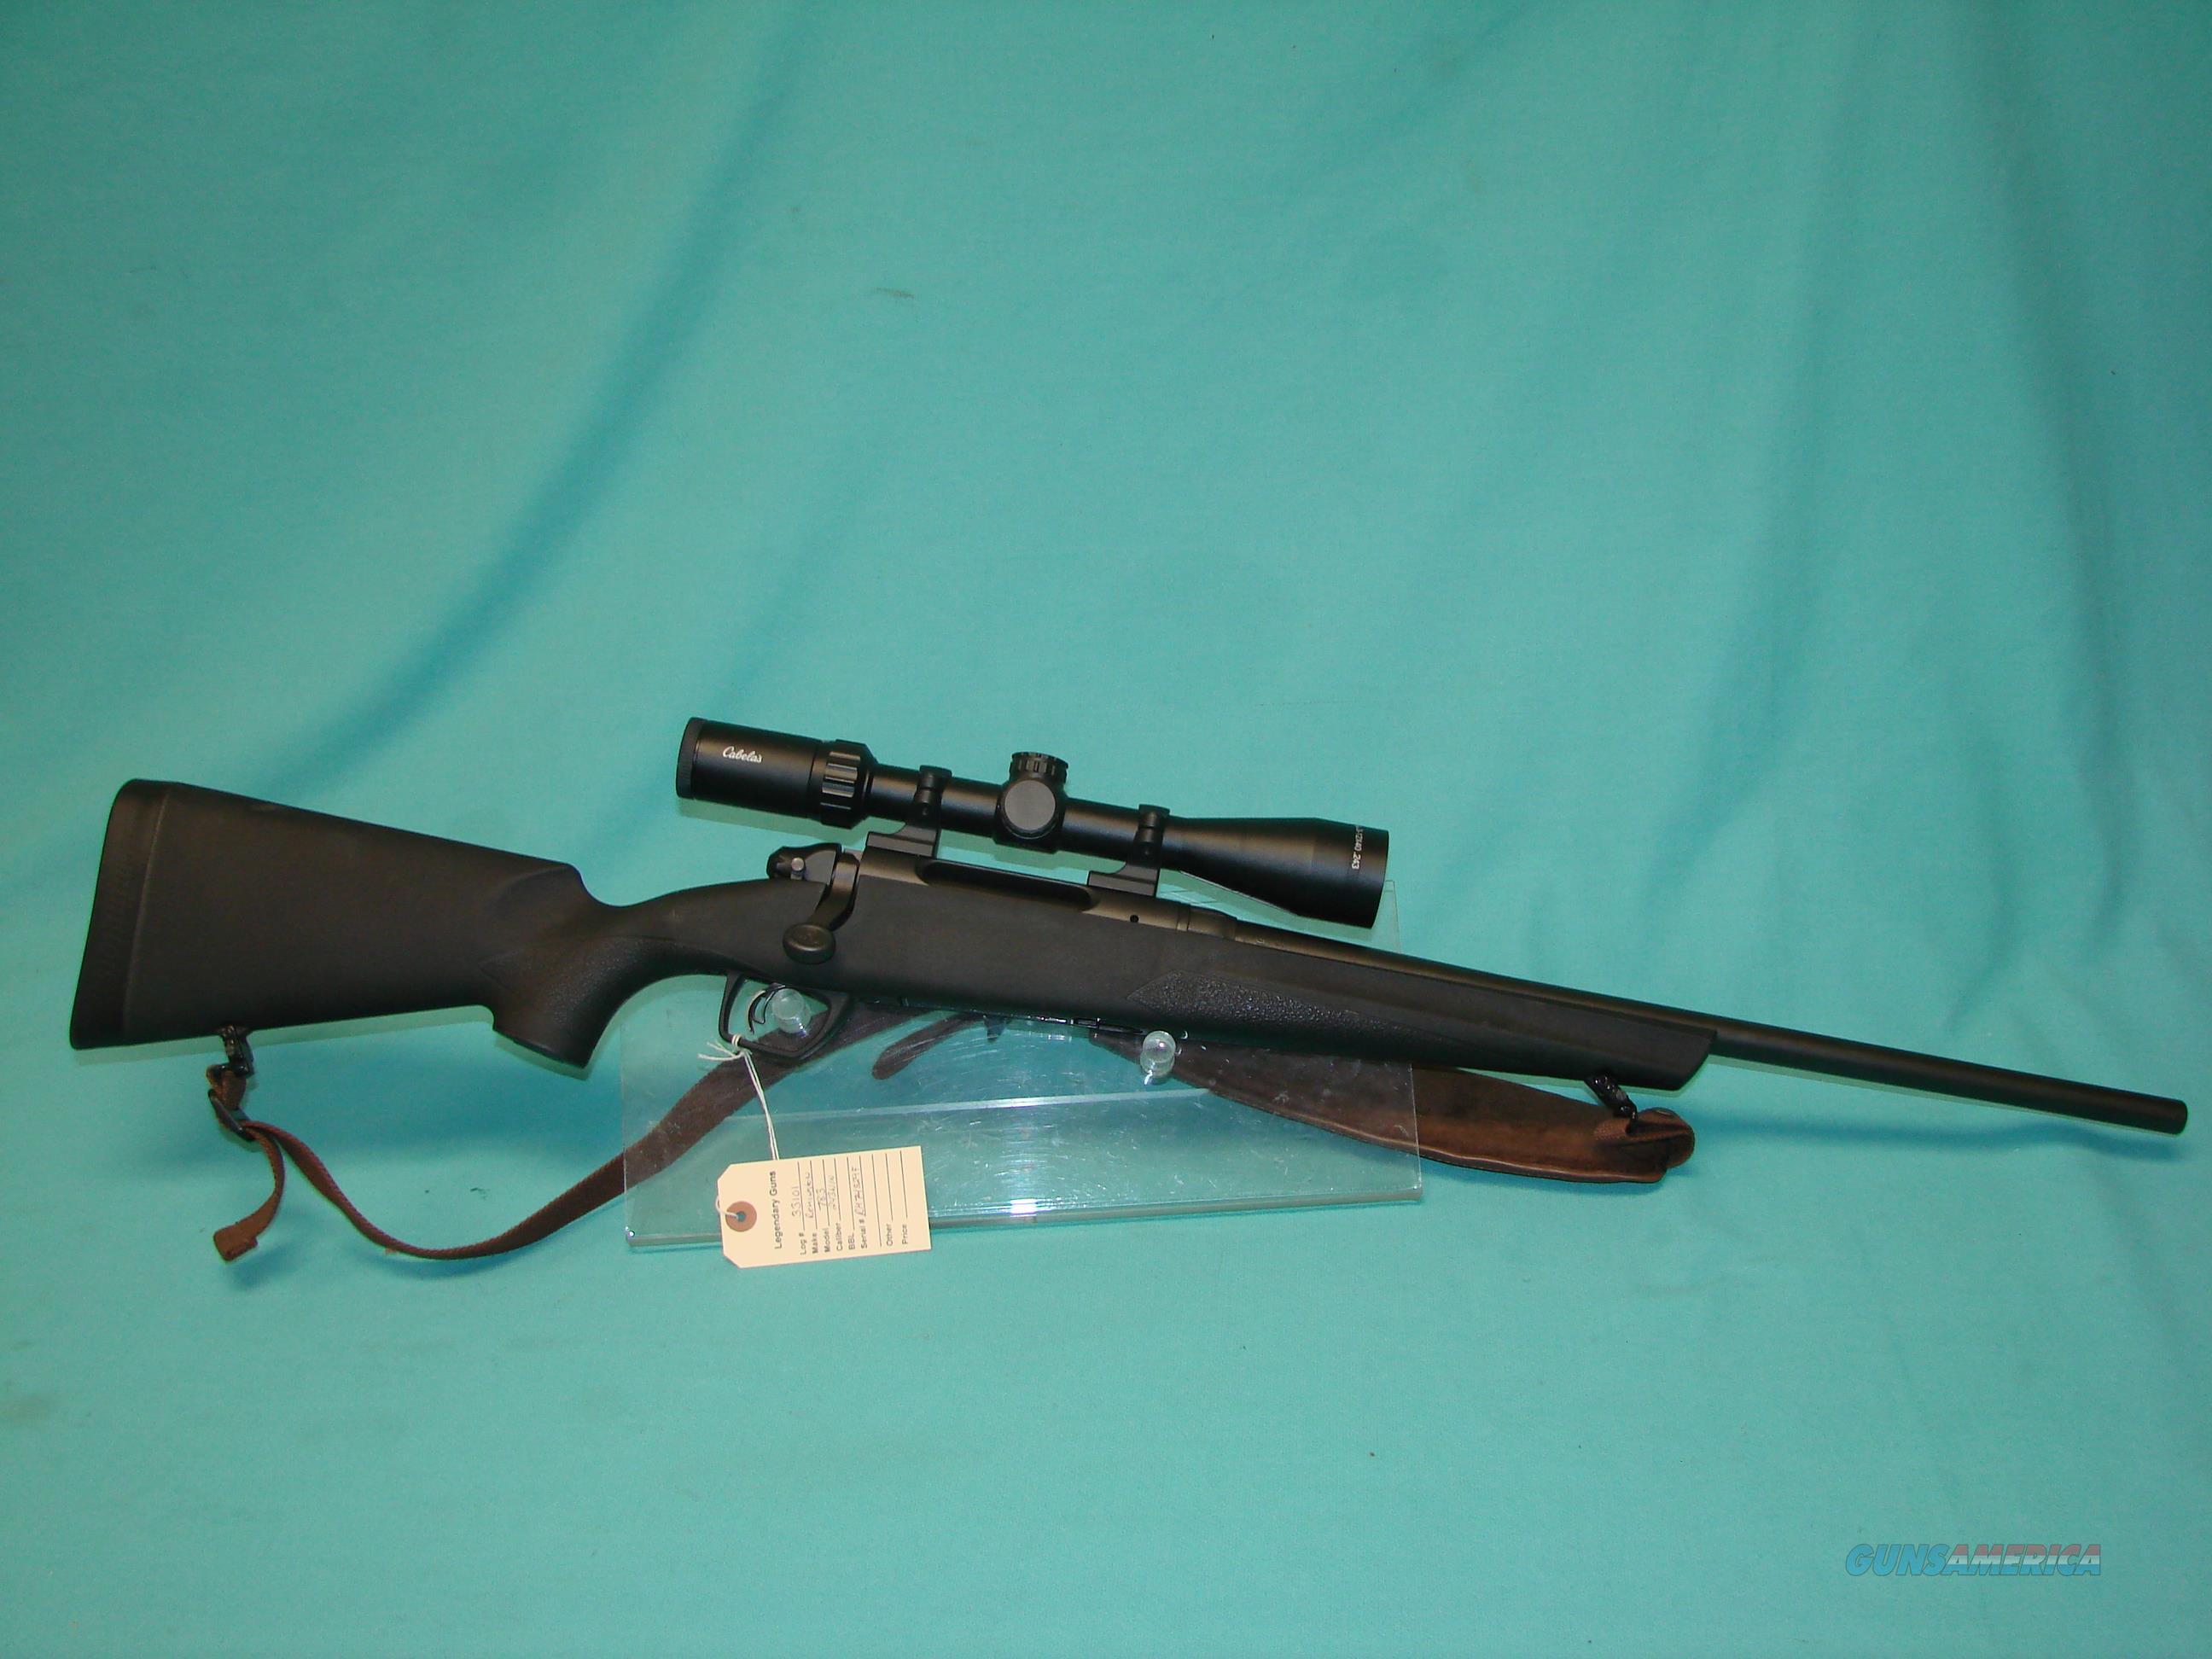 Remington 783 .243Win  Guns > Rifles > Remington Rifles - Modern > Bolt Action Non-Model 700 > Sporting